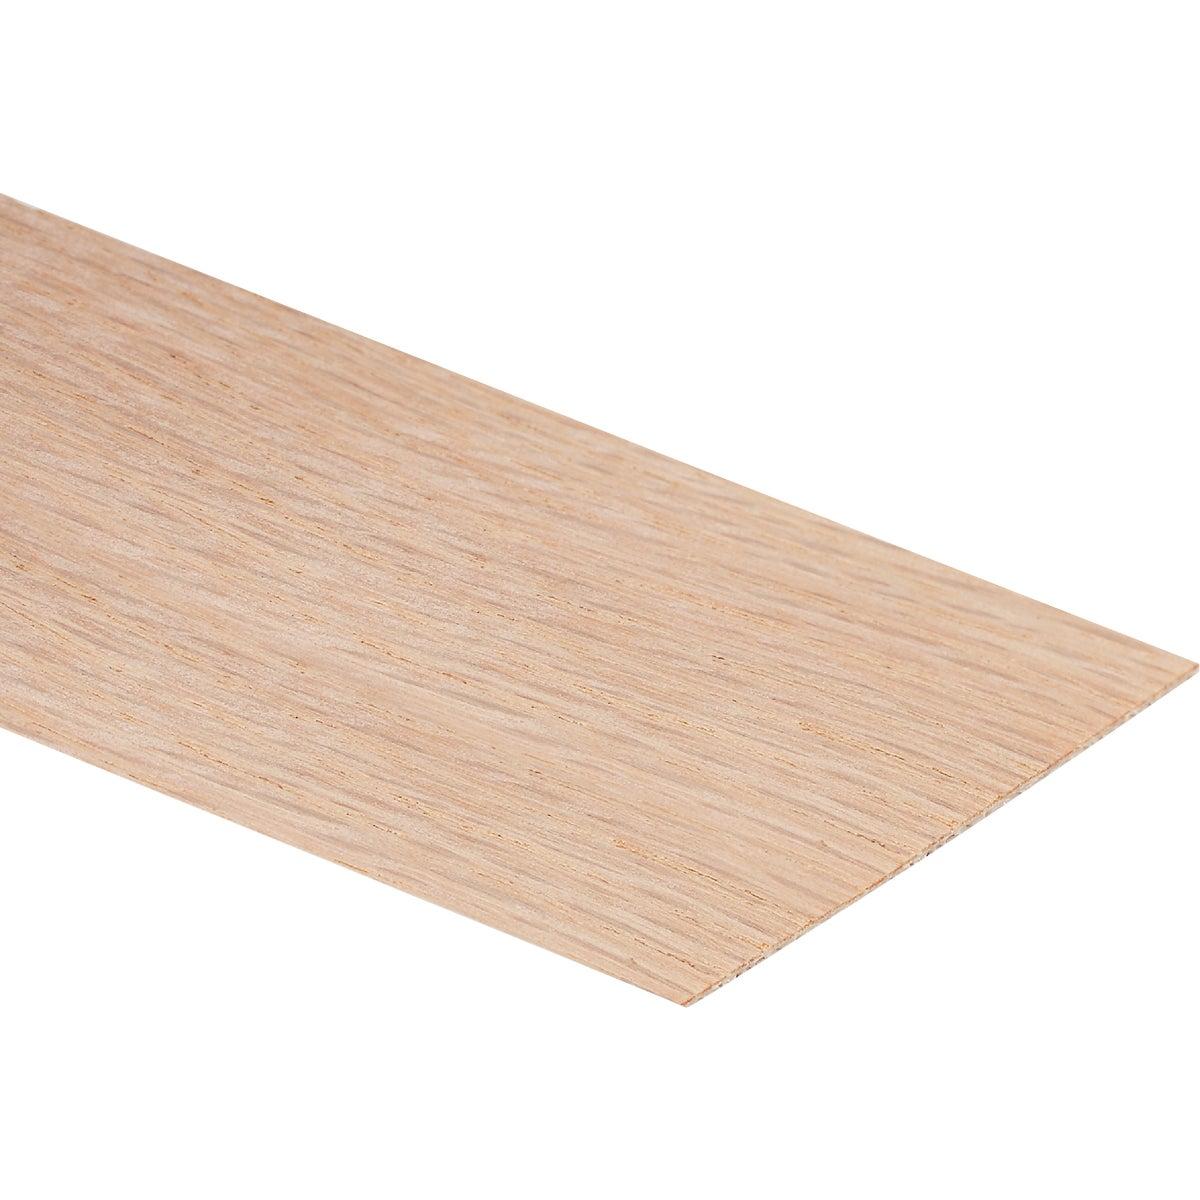 Band-It Wood Veneer Facing